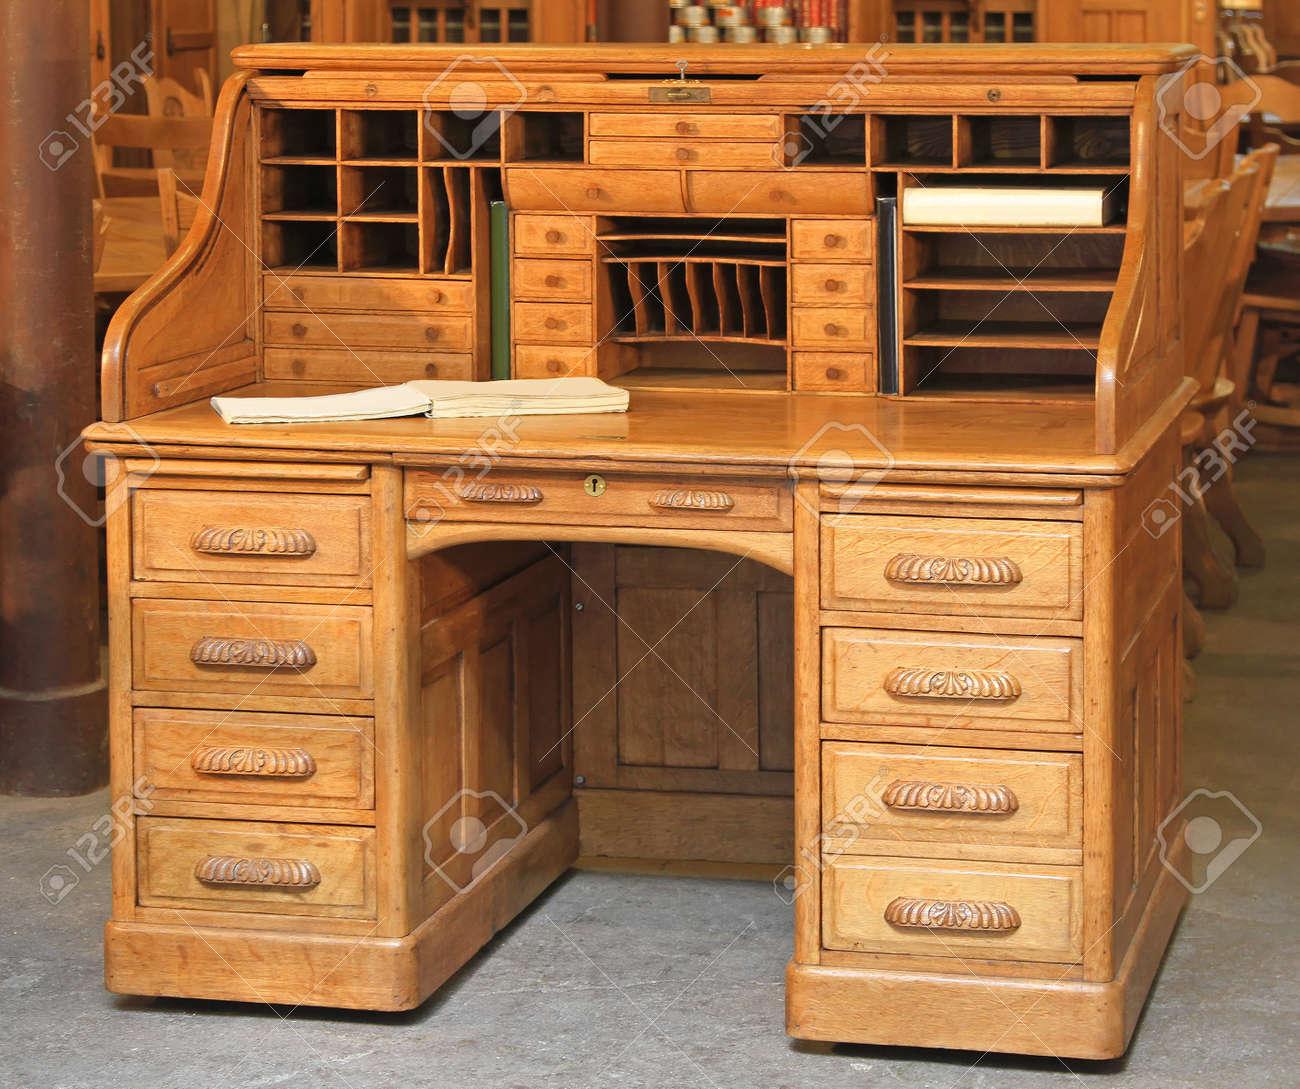 Vintage Secretary Desk >> Vintage Secretary Oak Wood Desk With Roll Top